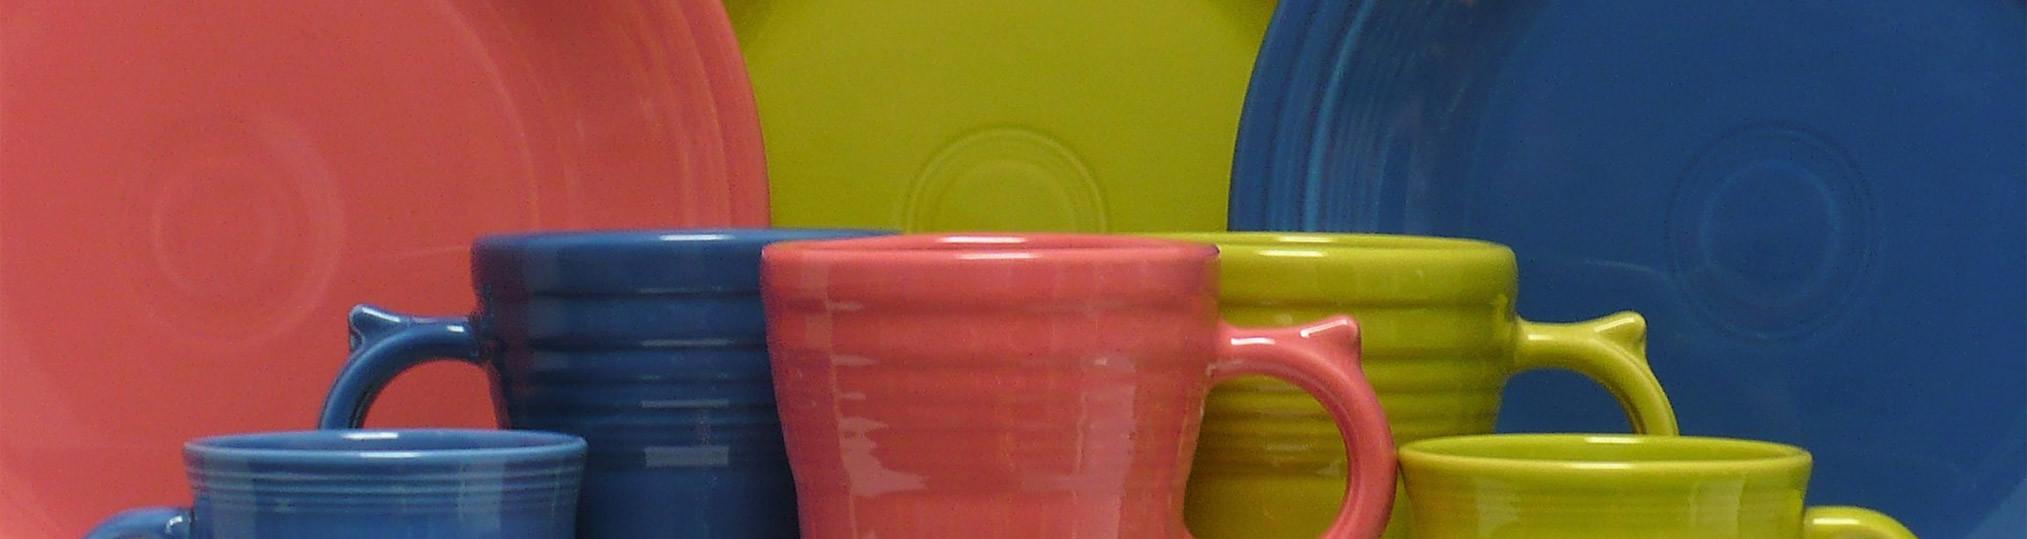 fiestaware millennium vase of flamingo fiestaa by color fiestawarestore com throughout flamingo